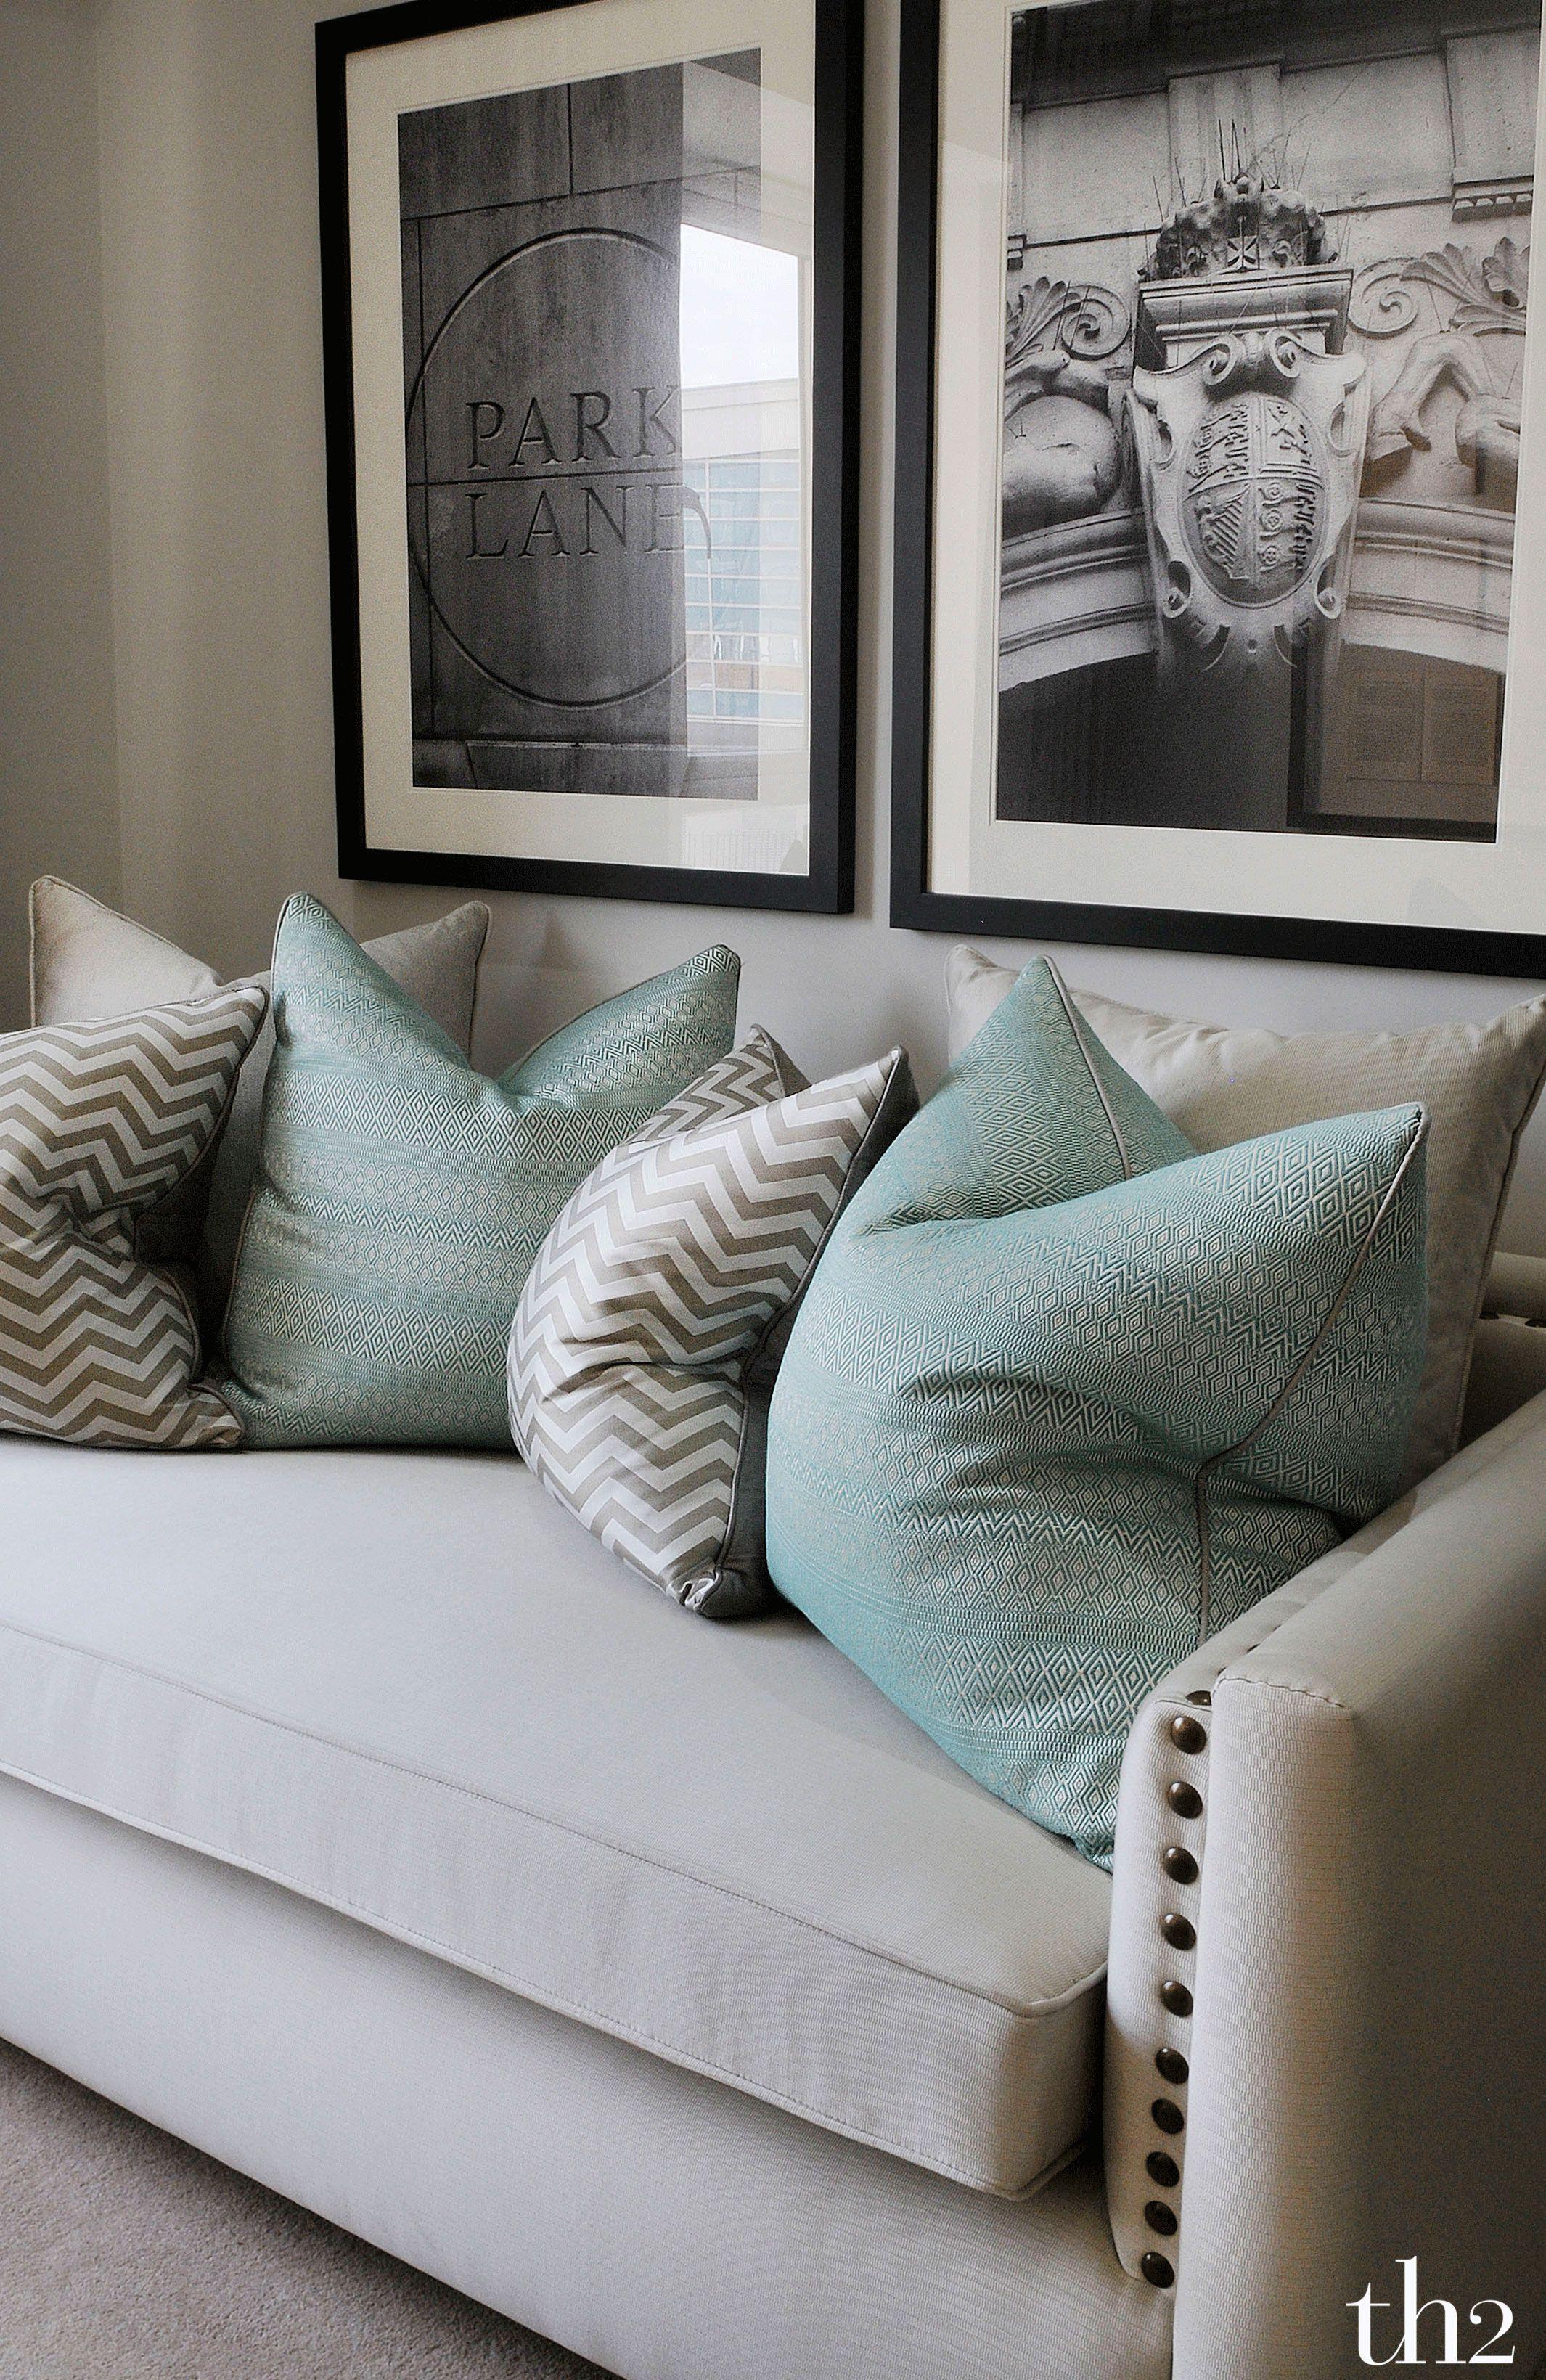 13 Glorious Decorative Pillows Modern Ideas Living Room Decor Pillows Pillow Decorative Bedroom Mint Living Rooms